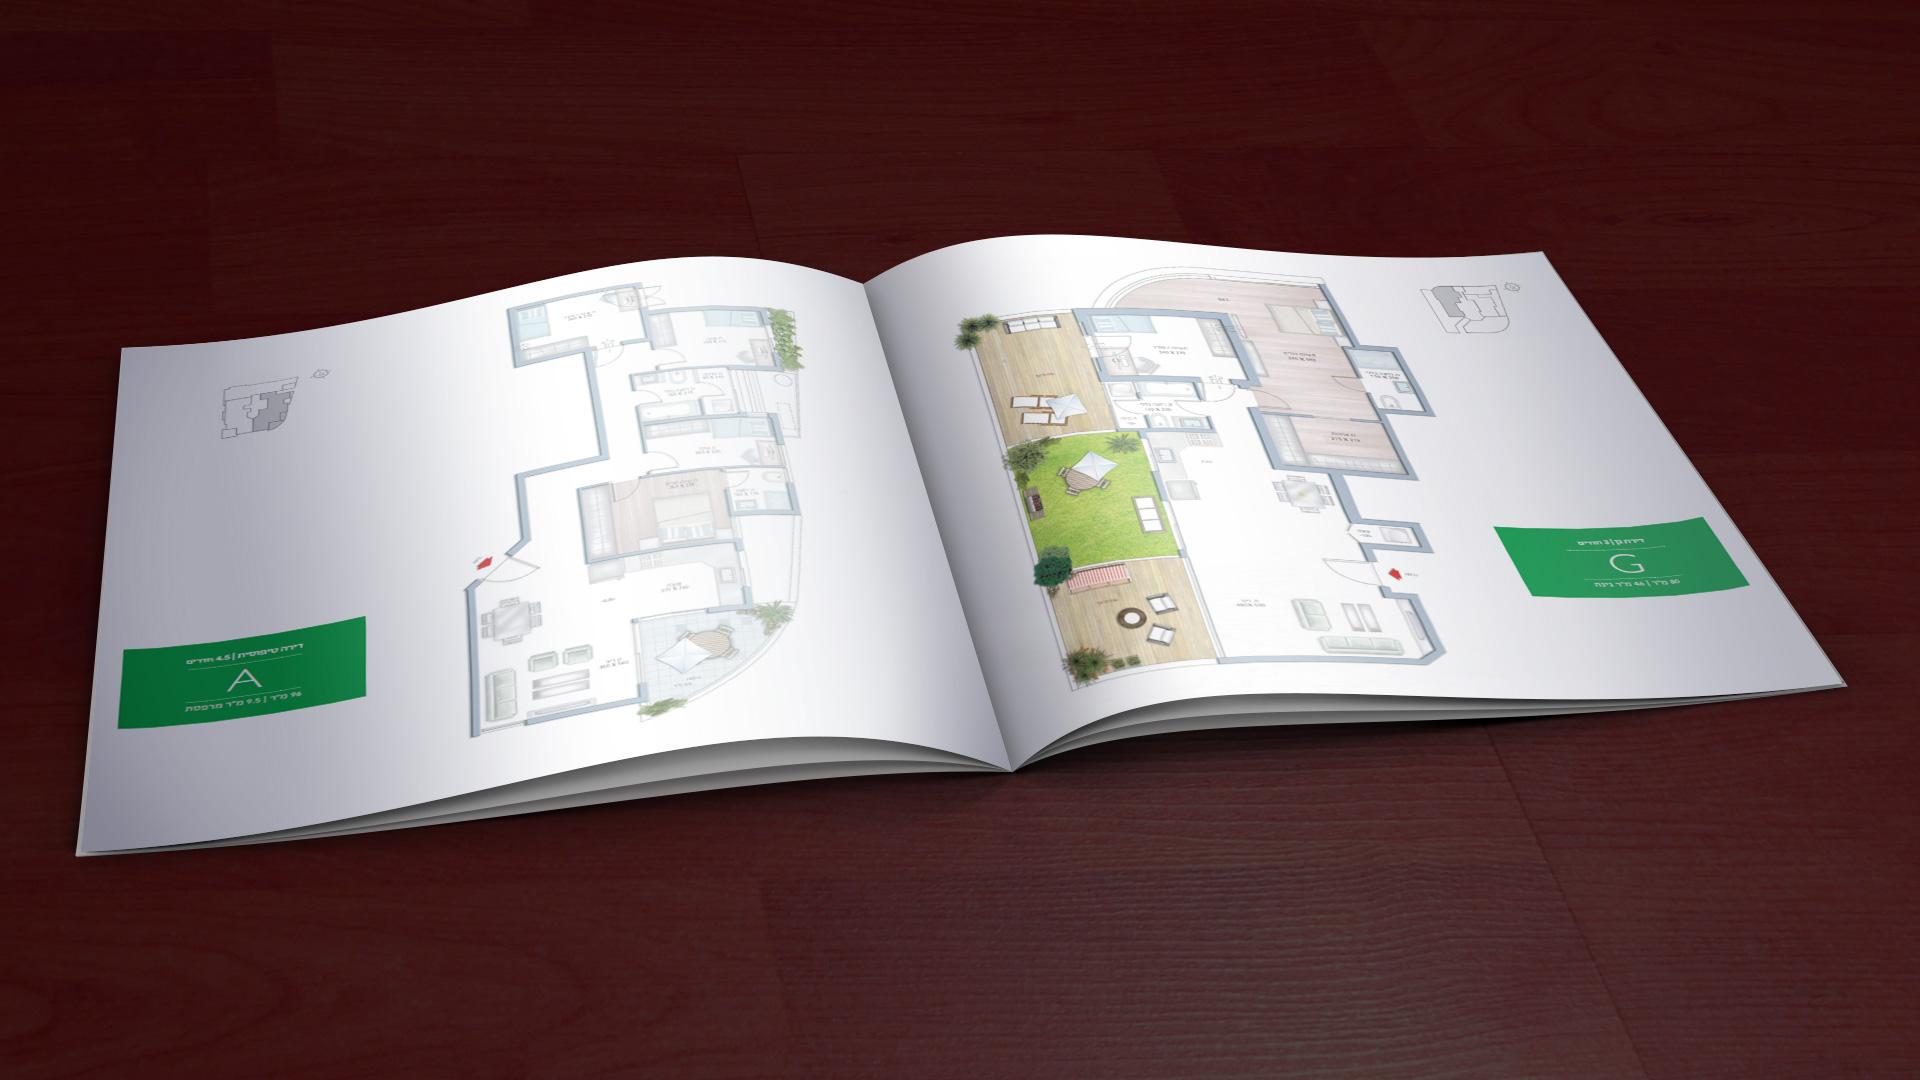 Sharpen | 11 Hakongress | Floorplans